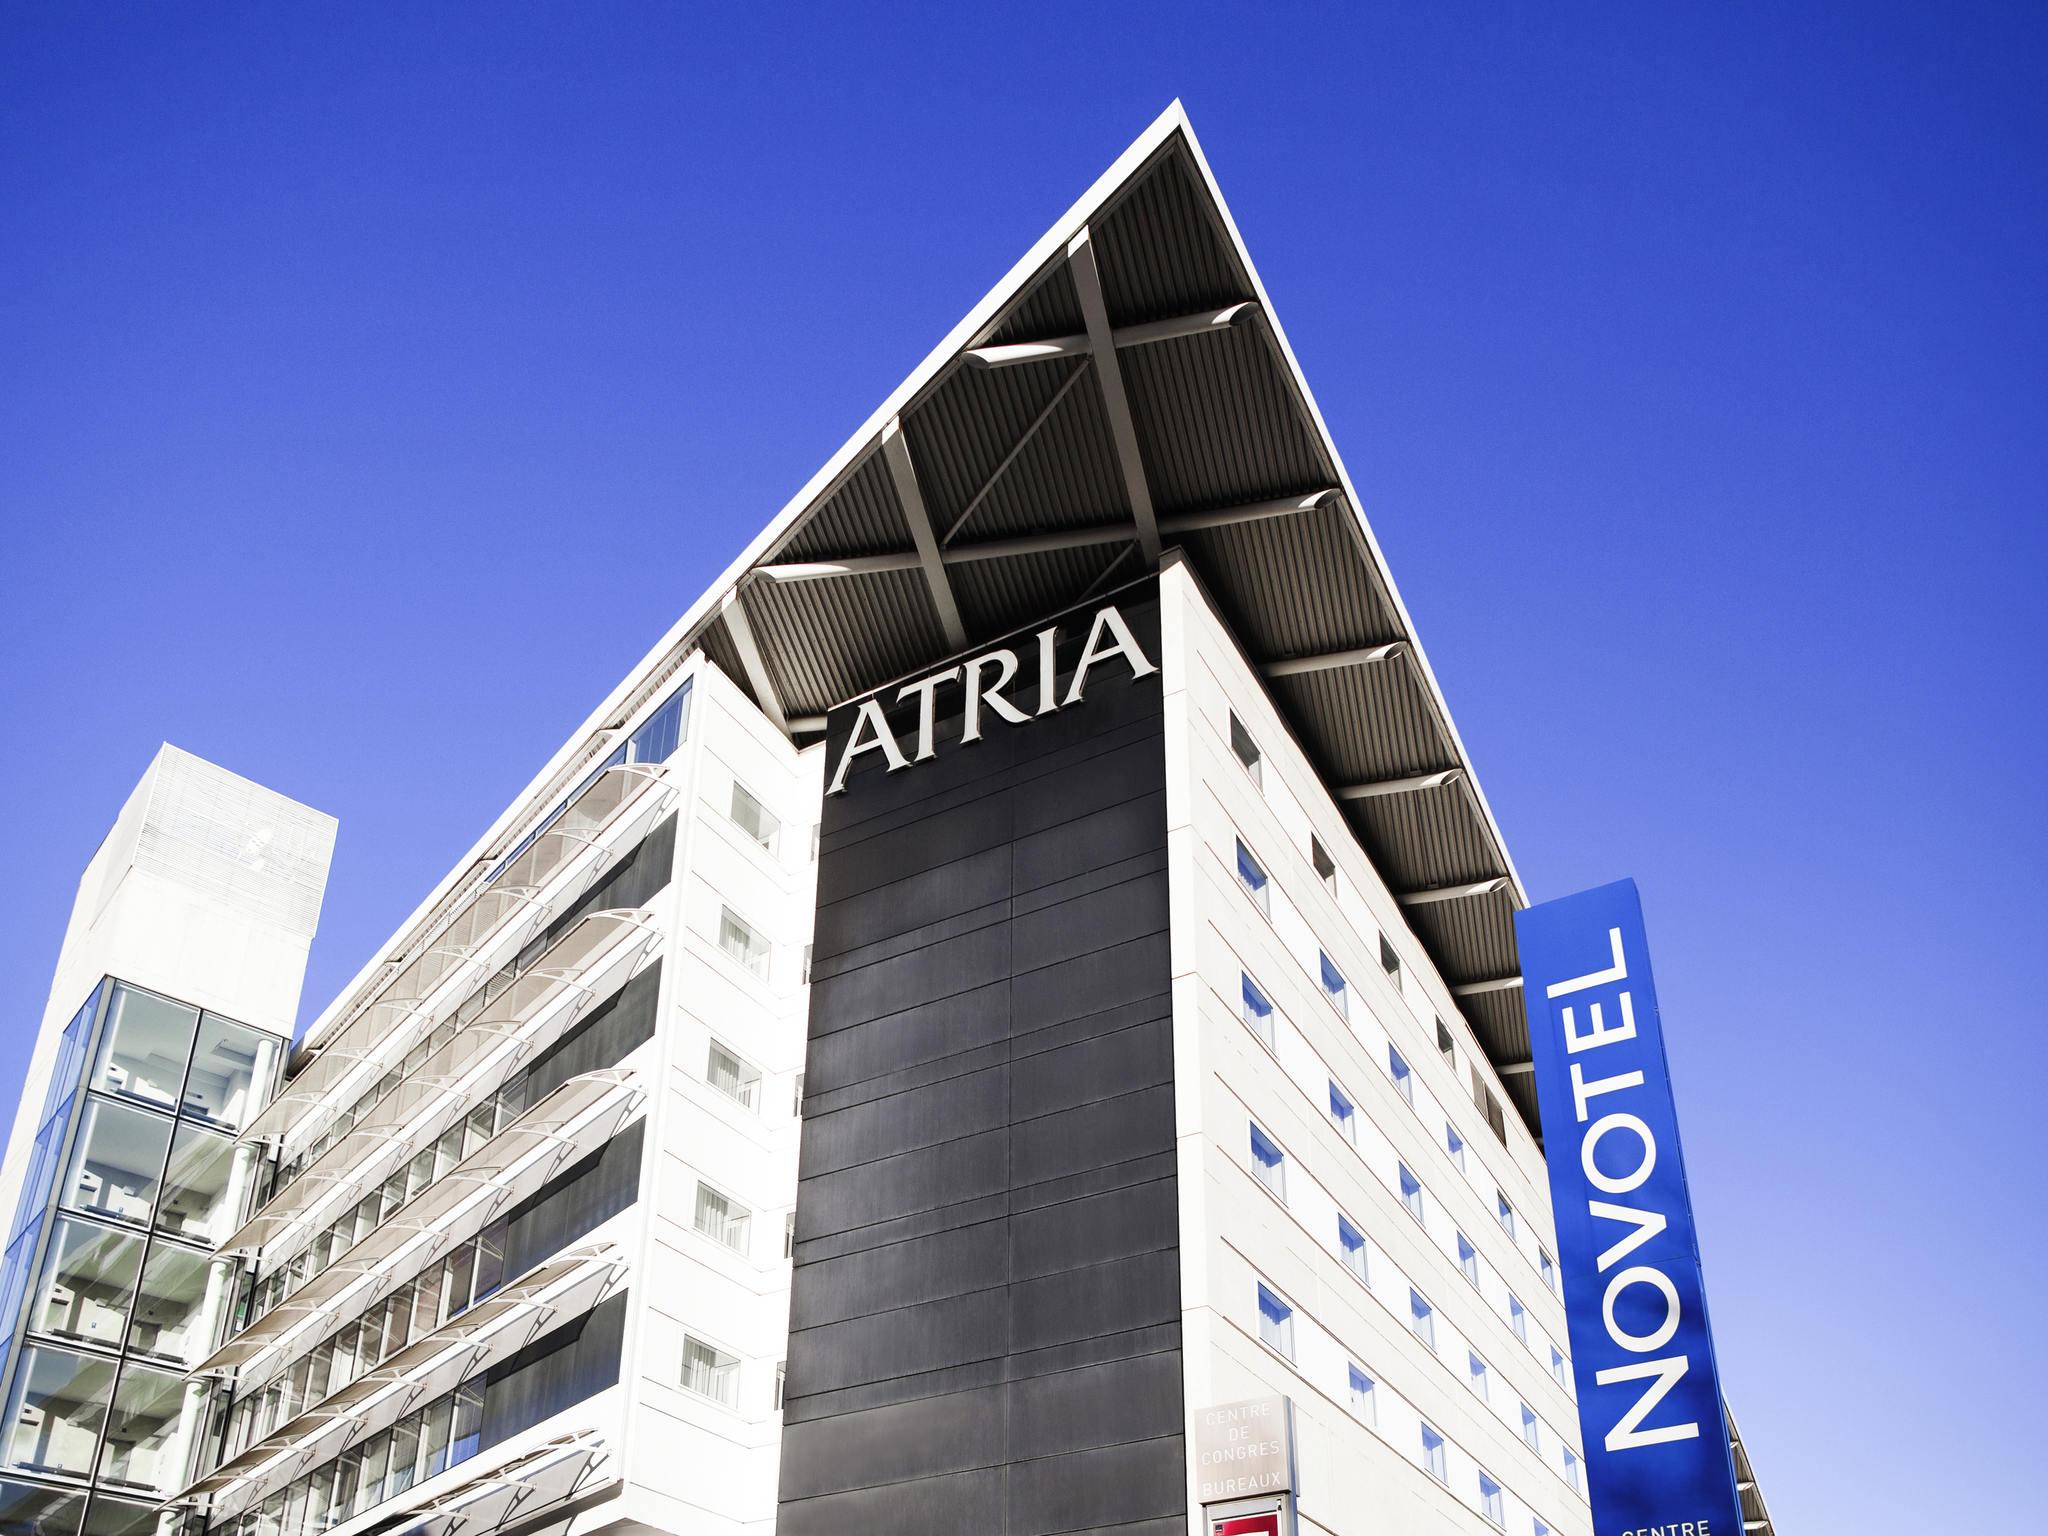 Hotel – Novotel Belfort Centre Atria